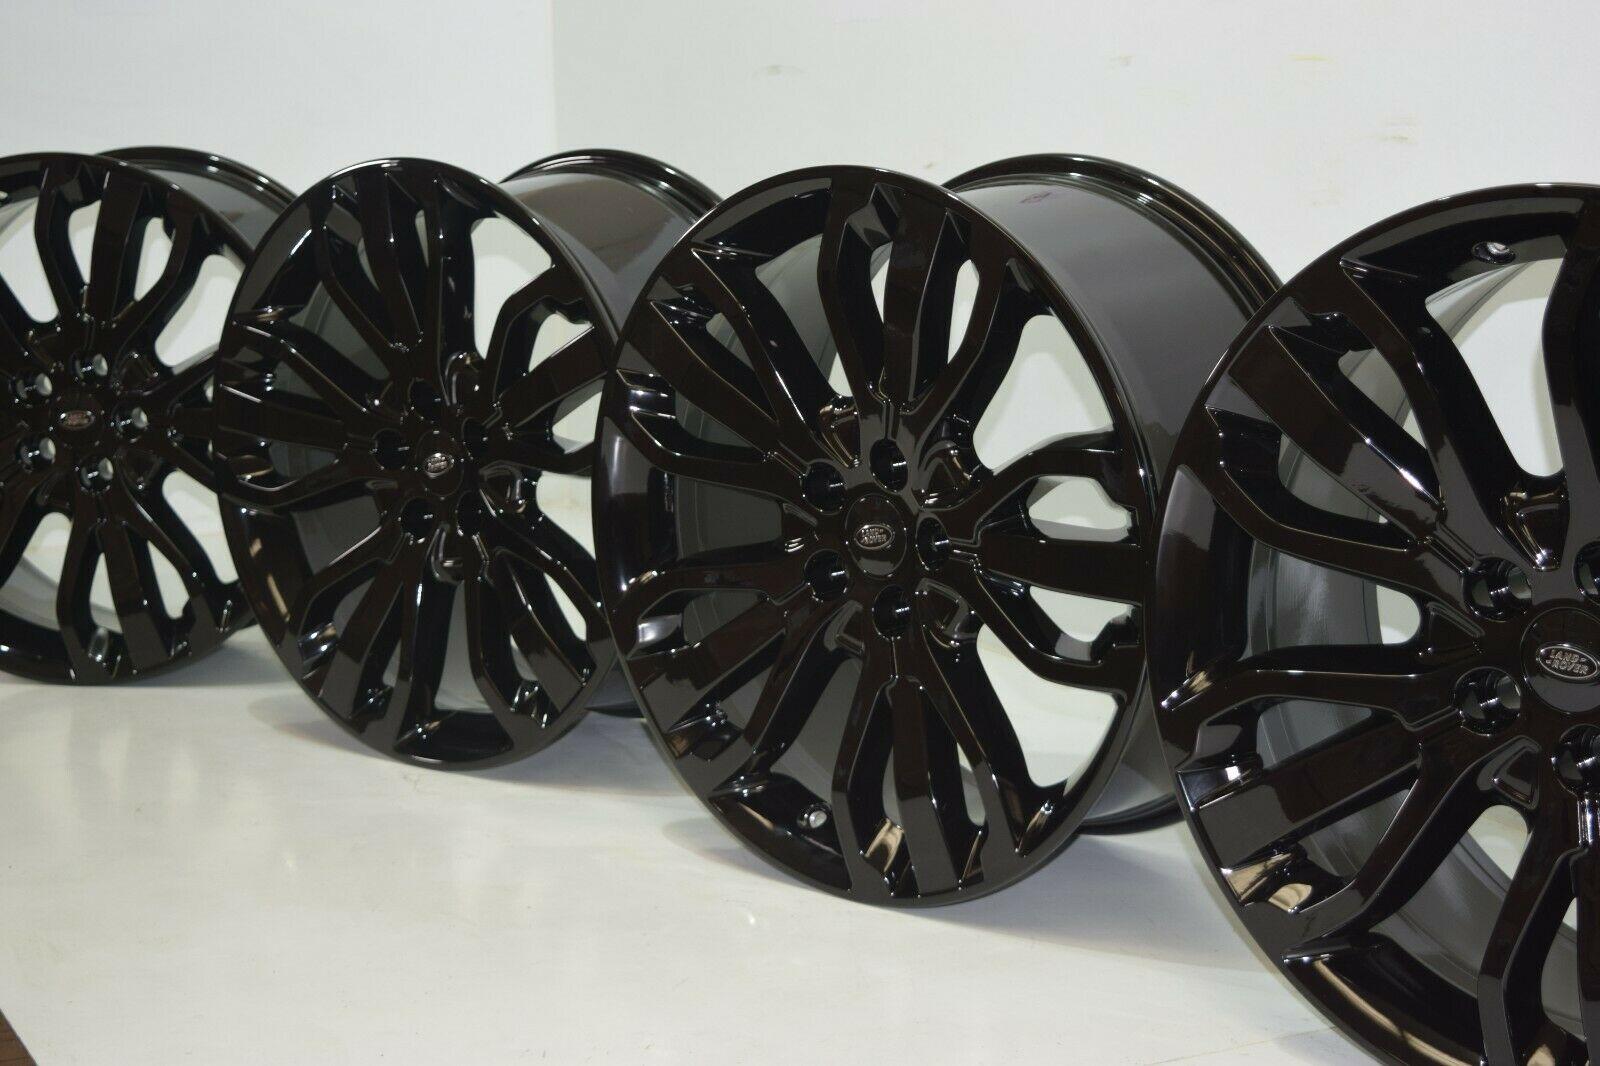 Range Rover 21″ Style 507 In brand new gloss black wheels rims